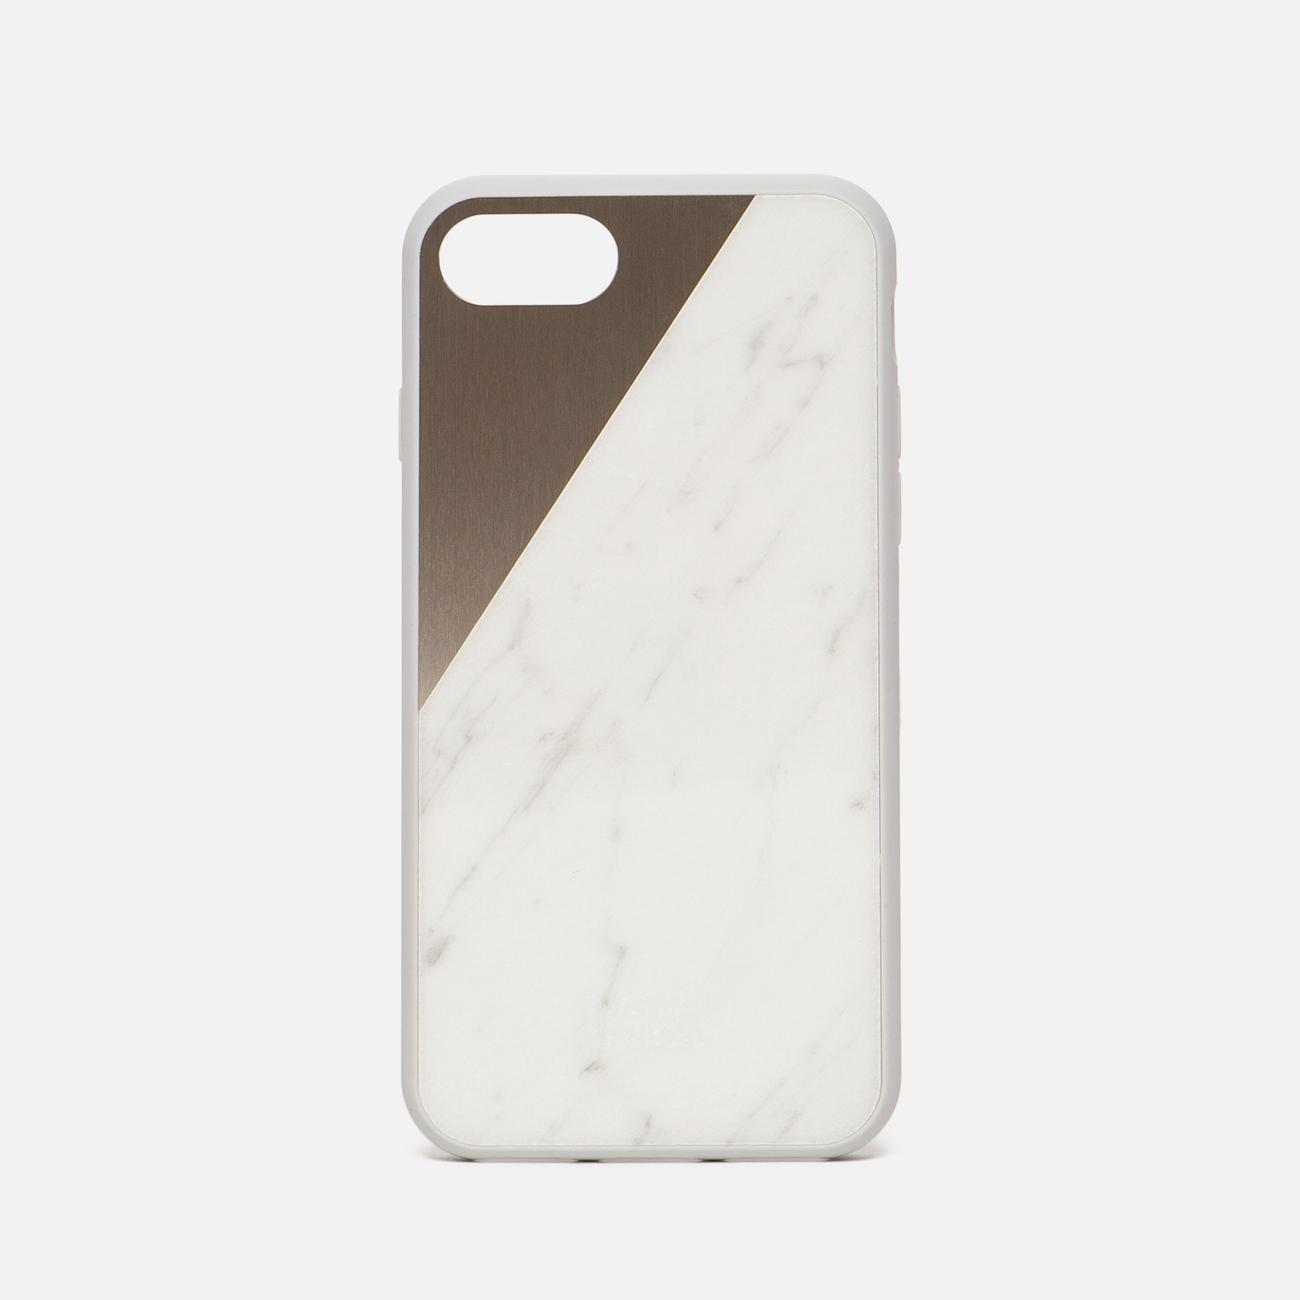 Чехол Native Union Clic Marble iPhone 7 White/Rose